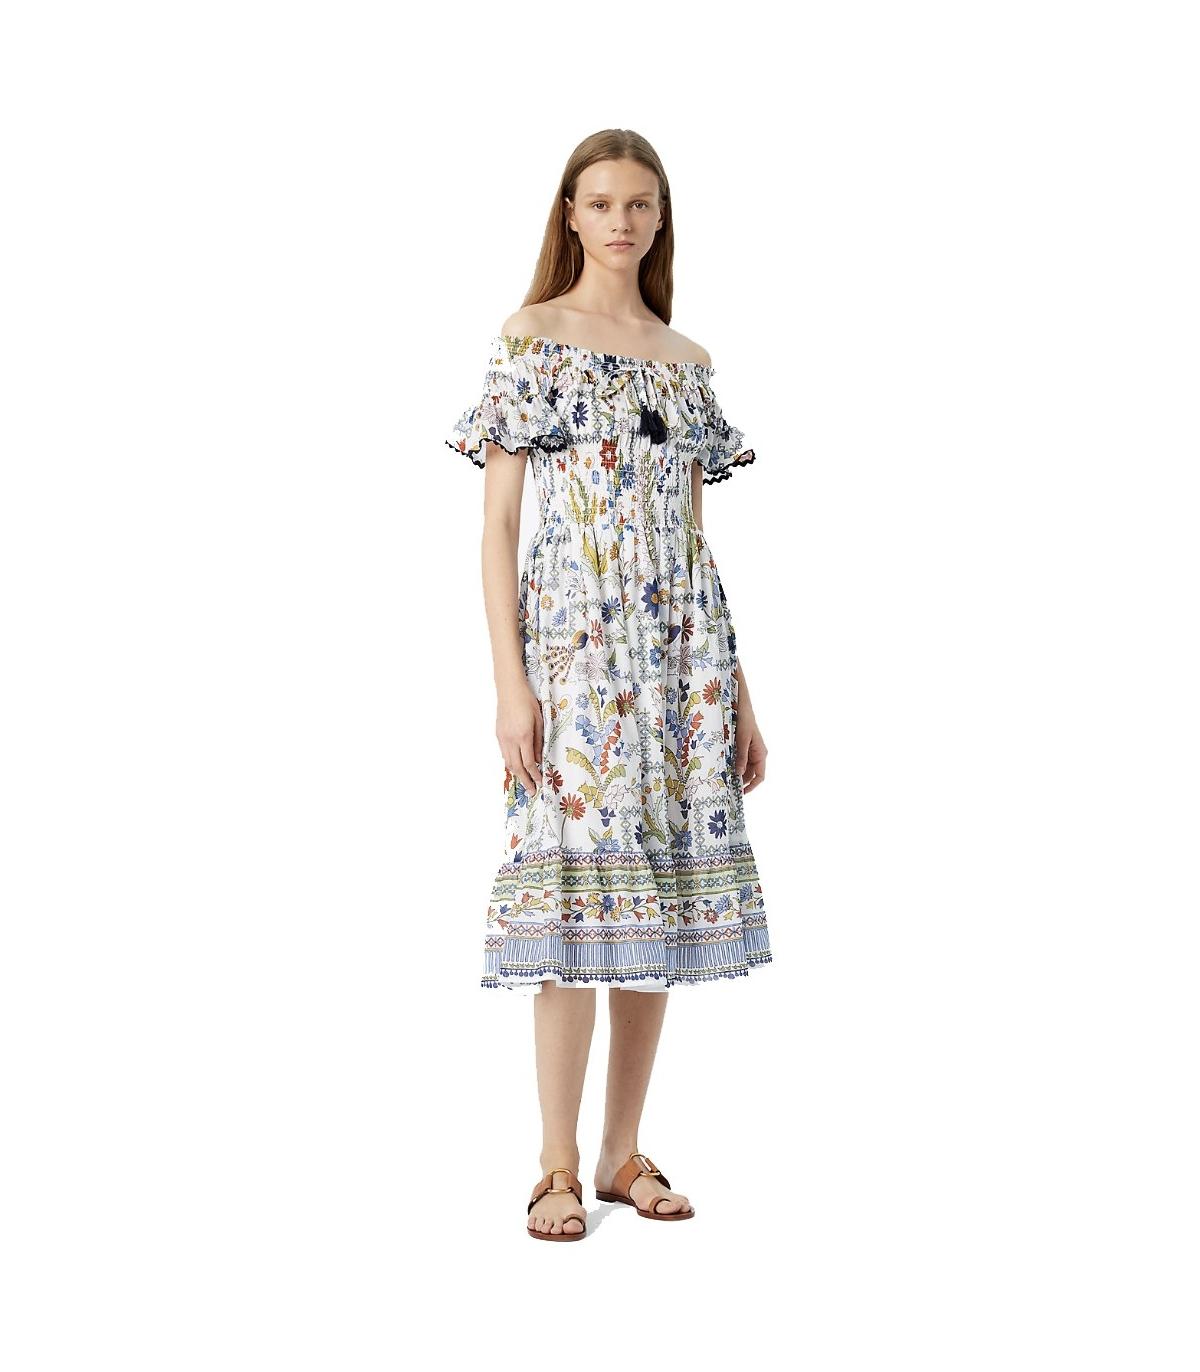 50765871c4f Tory Burch MEADOW FOLLY DRESS